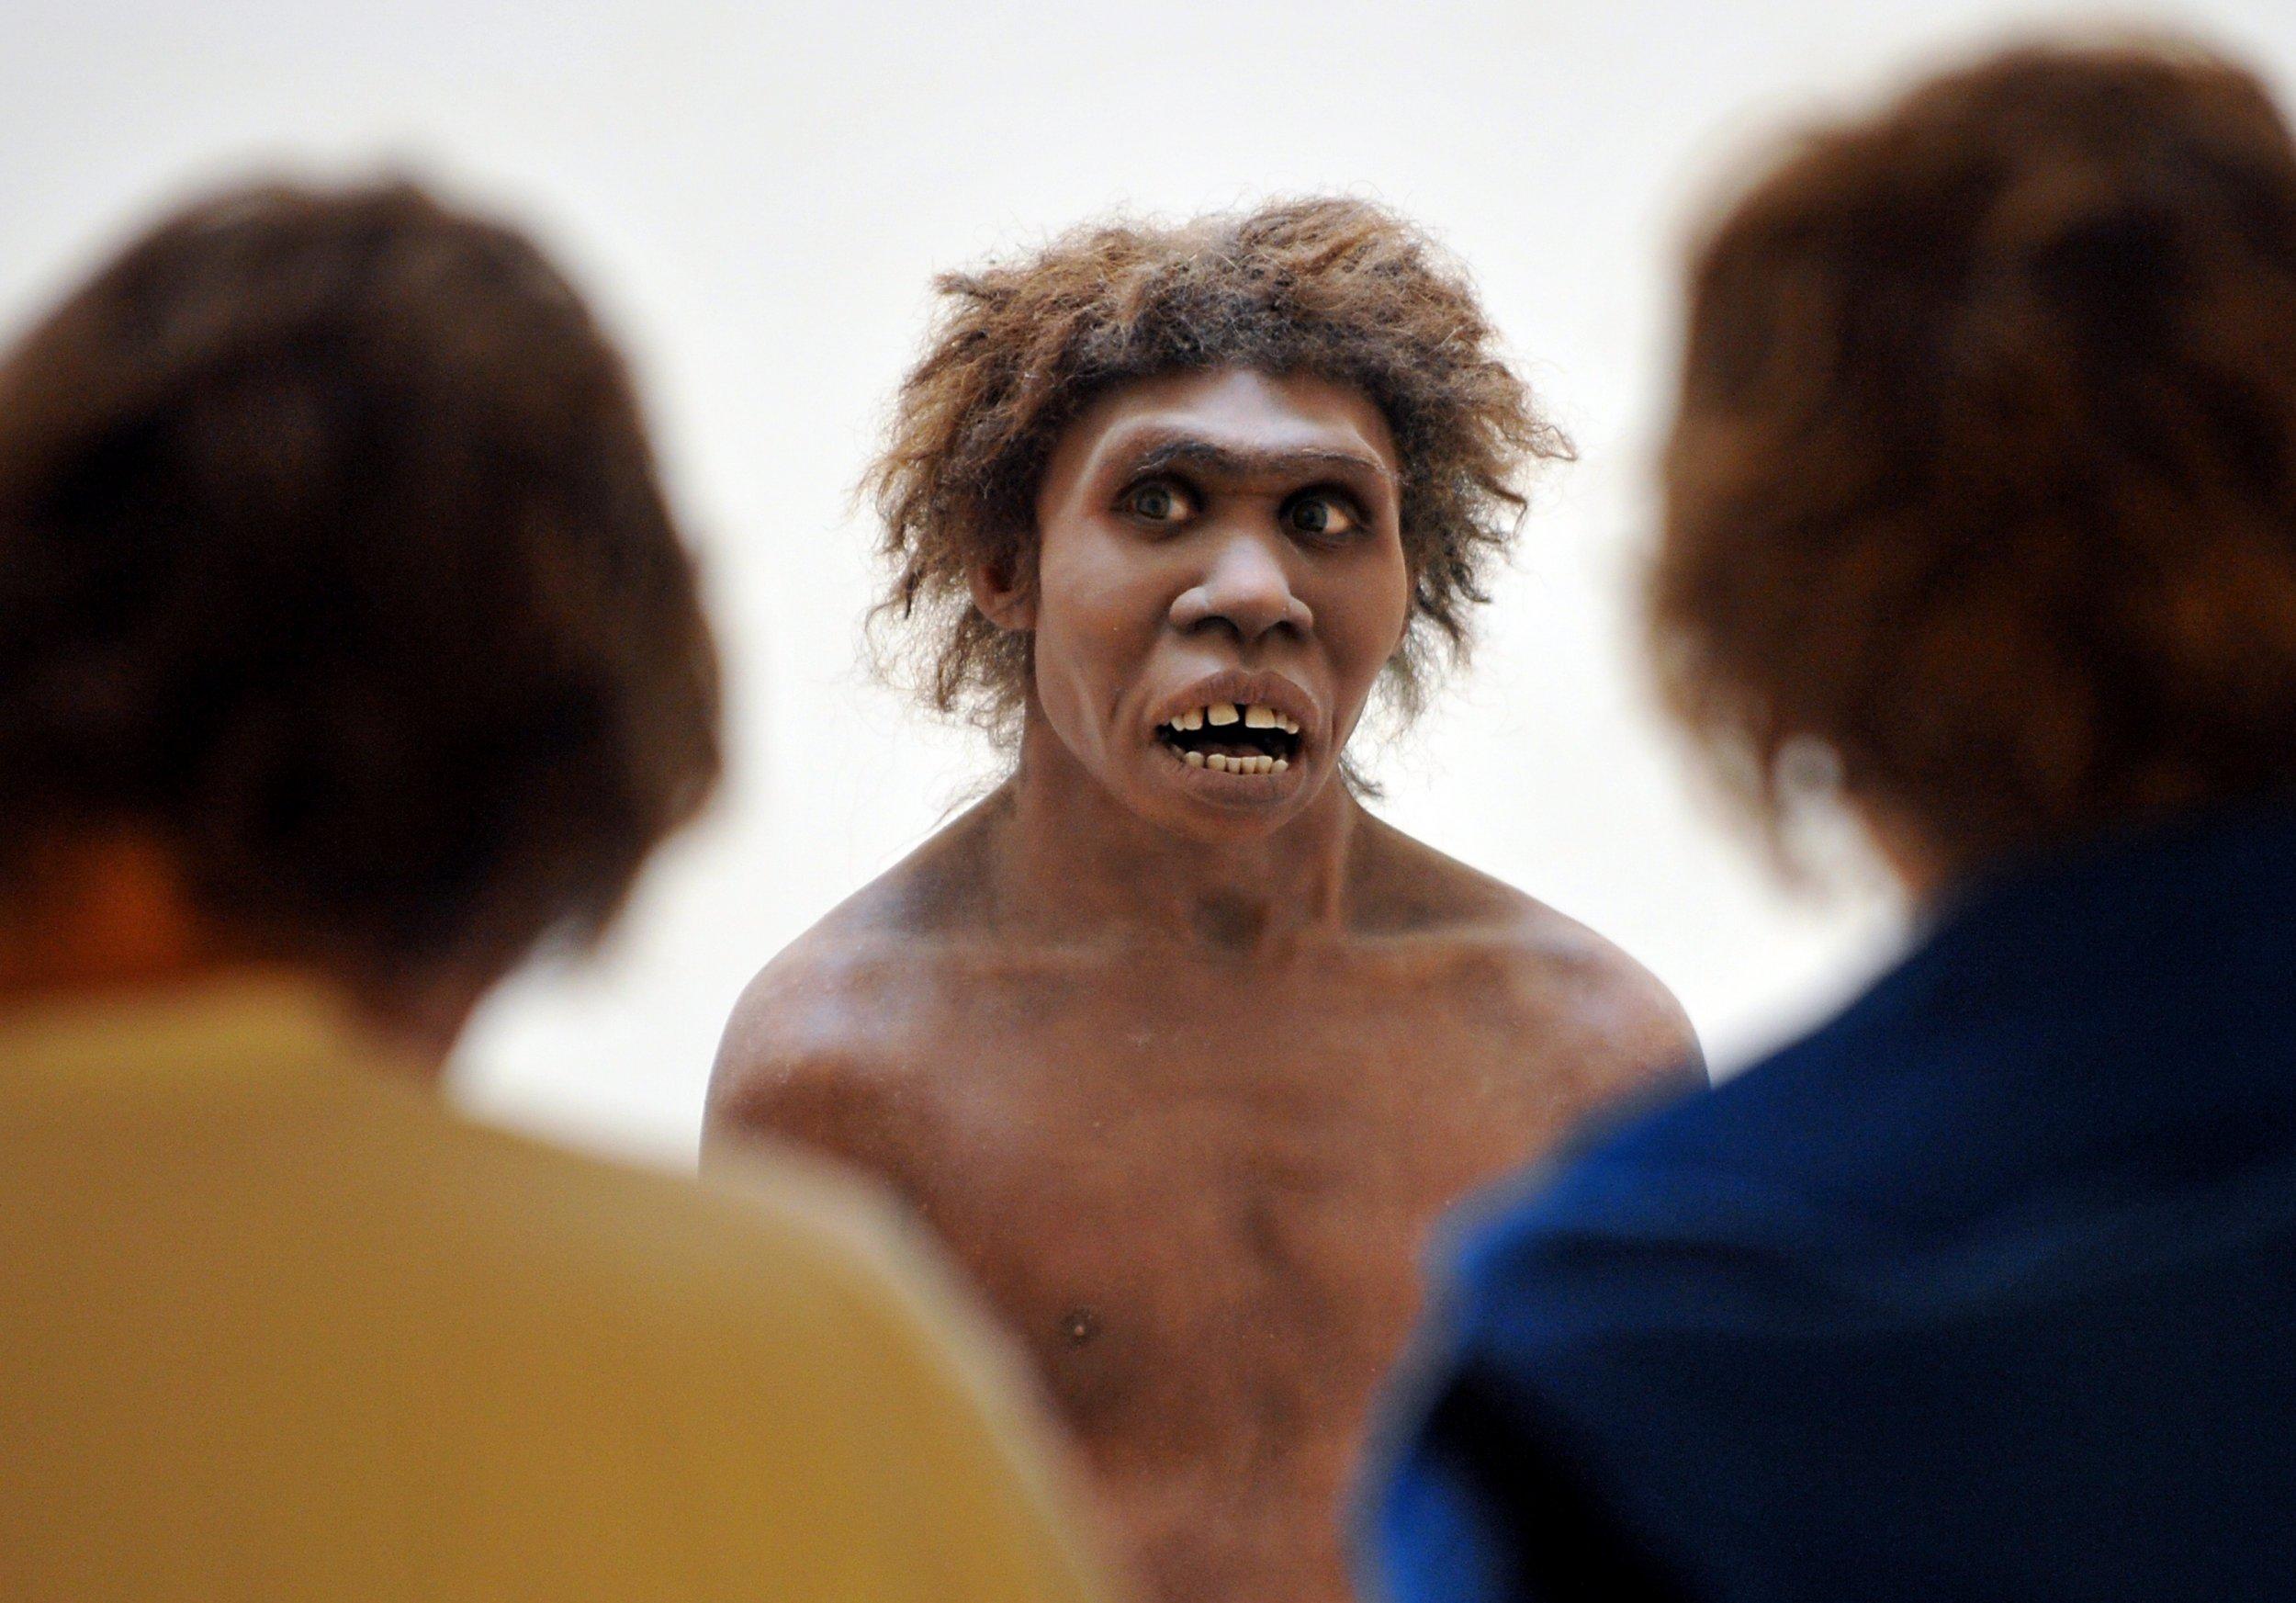 11_19_Neanderthal